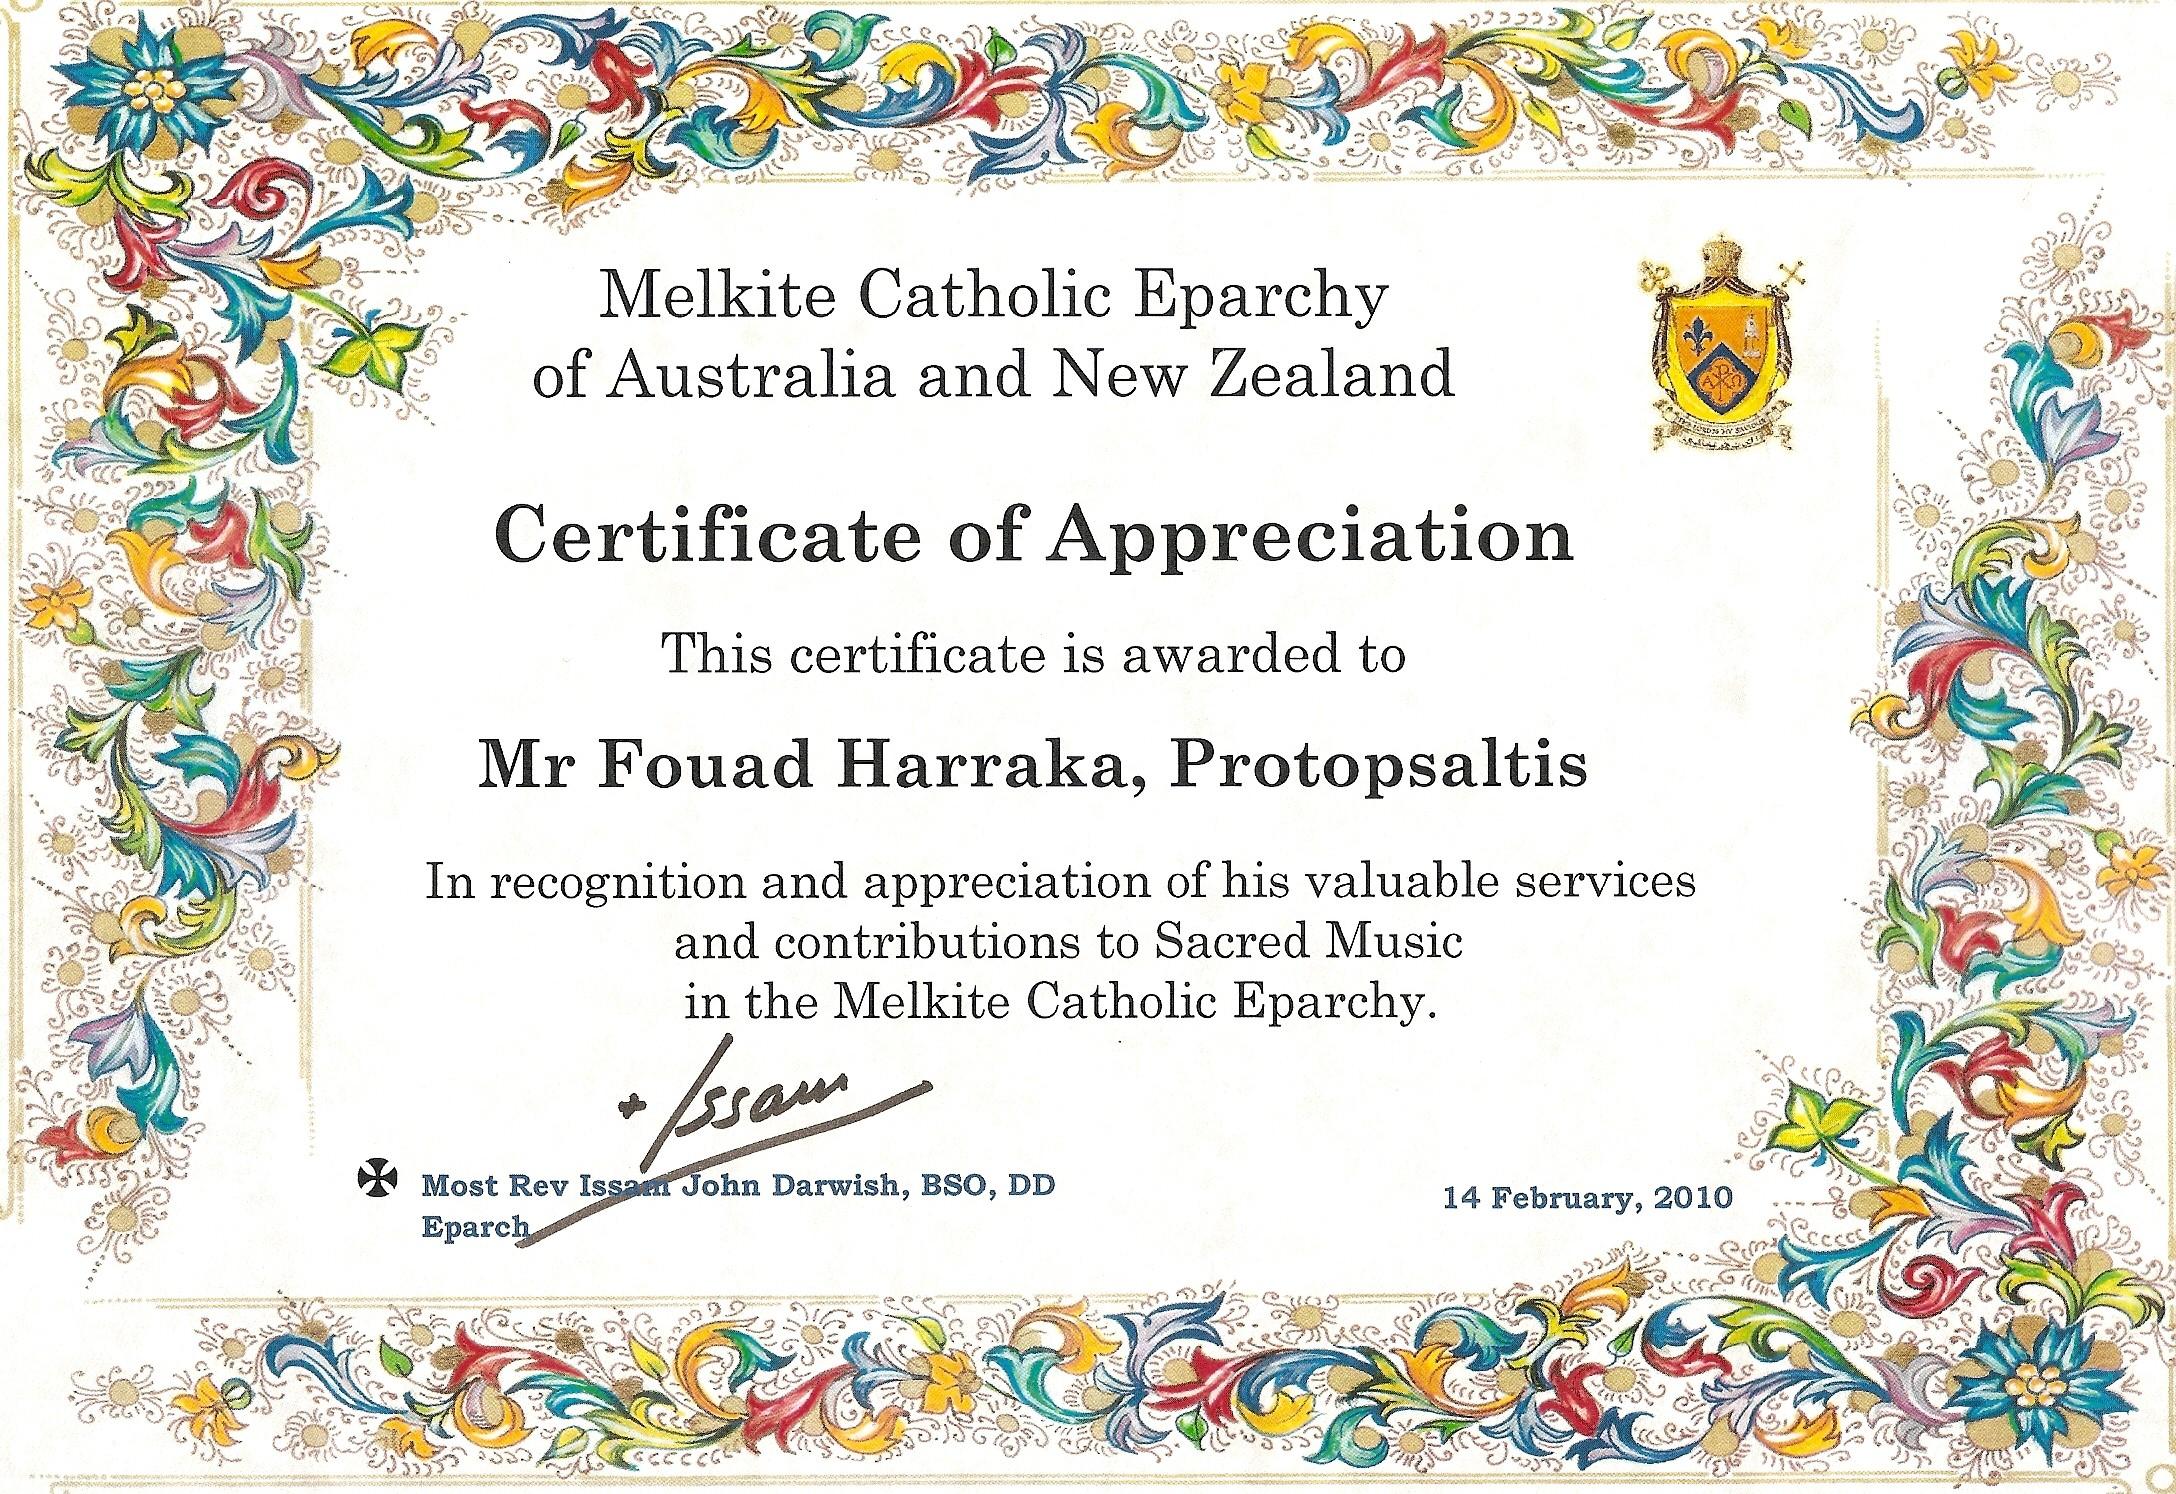 Certificate of appreciation dva choice image certificate design music certificate templates images templates example free download certificate of appreciation music images certificate design and yelopaper Choice Image